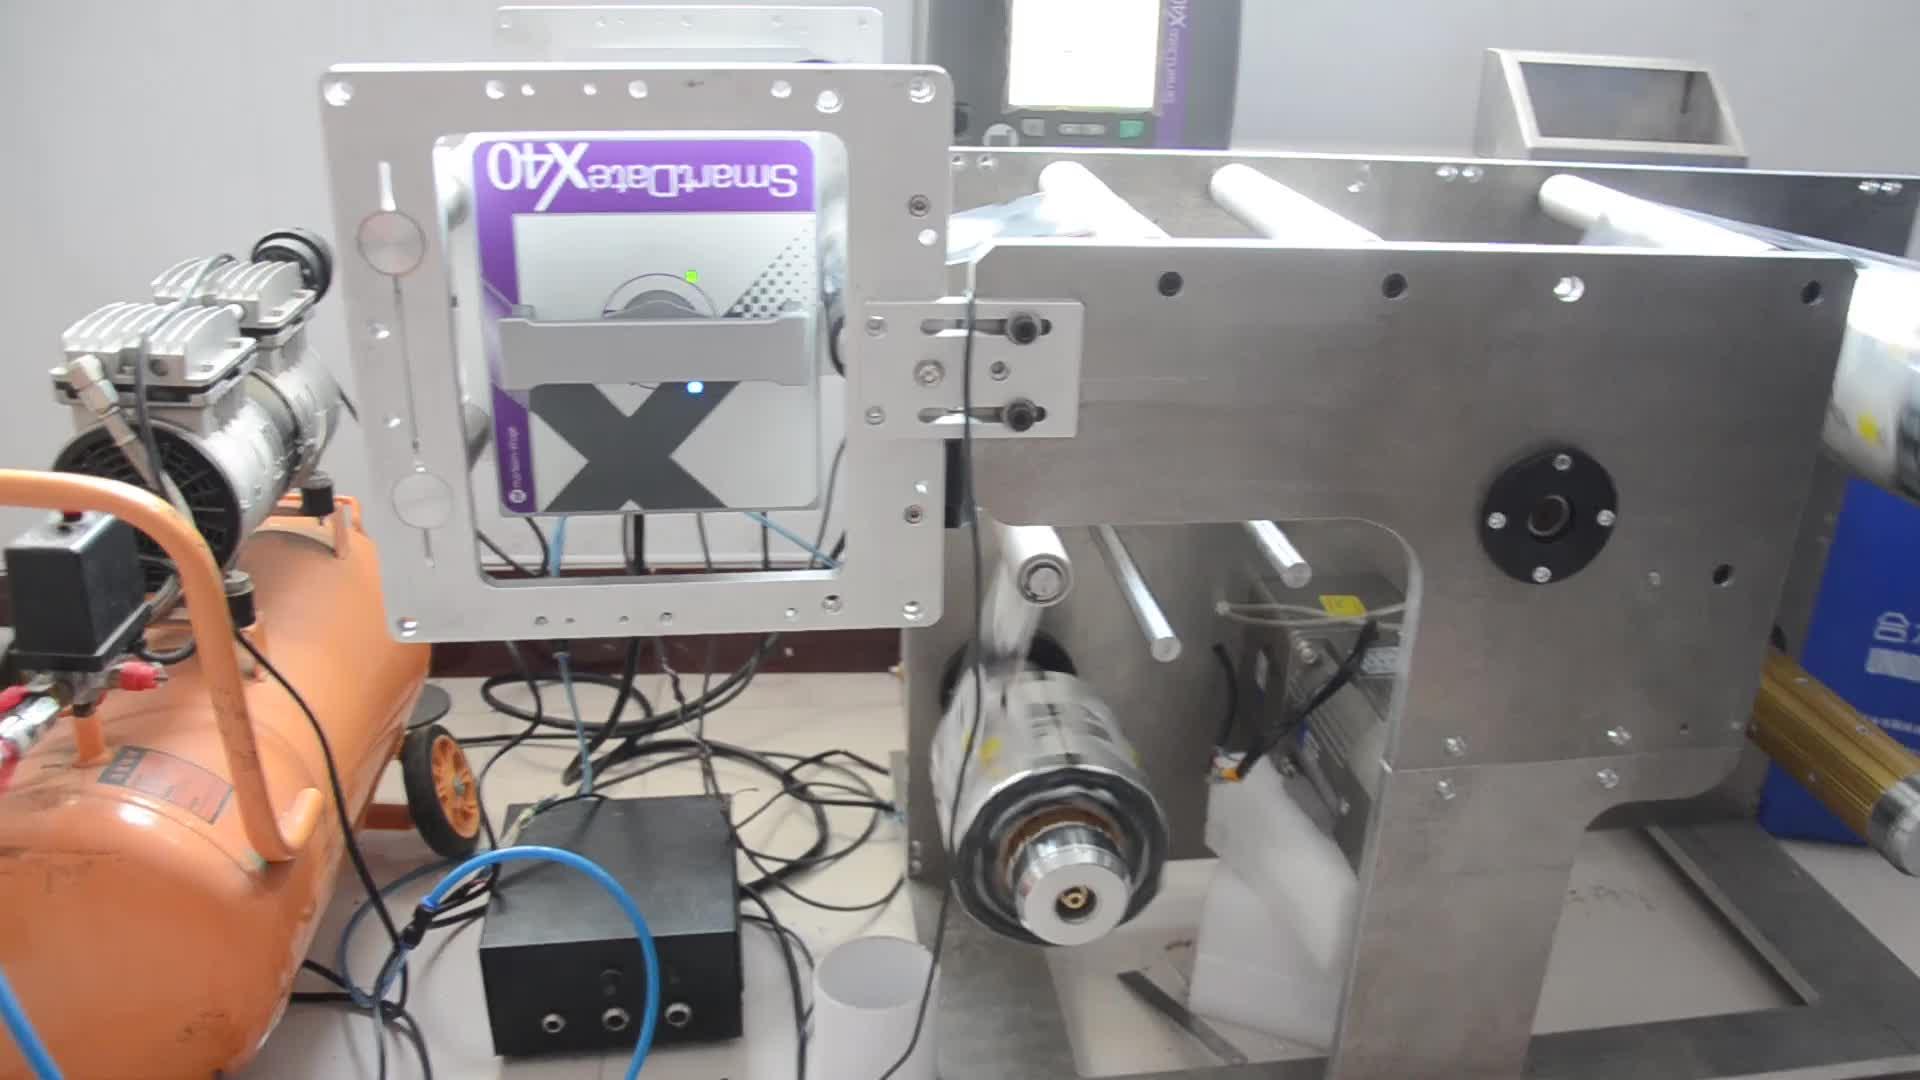 32mm Kyocera thermal transfer printhead assy for Markem 8018 printer